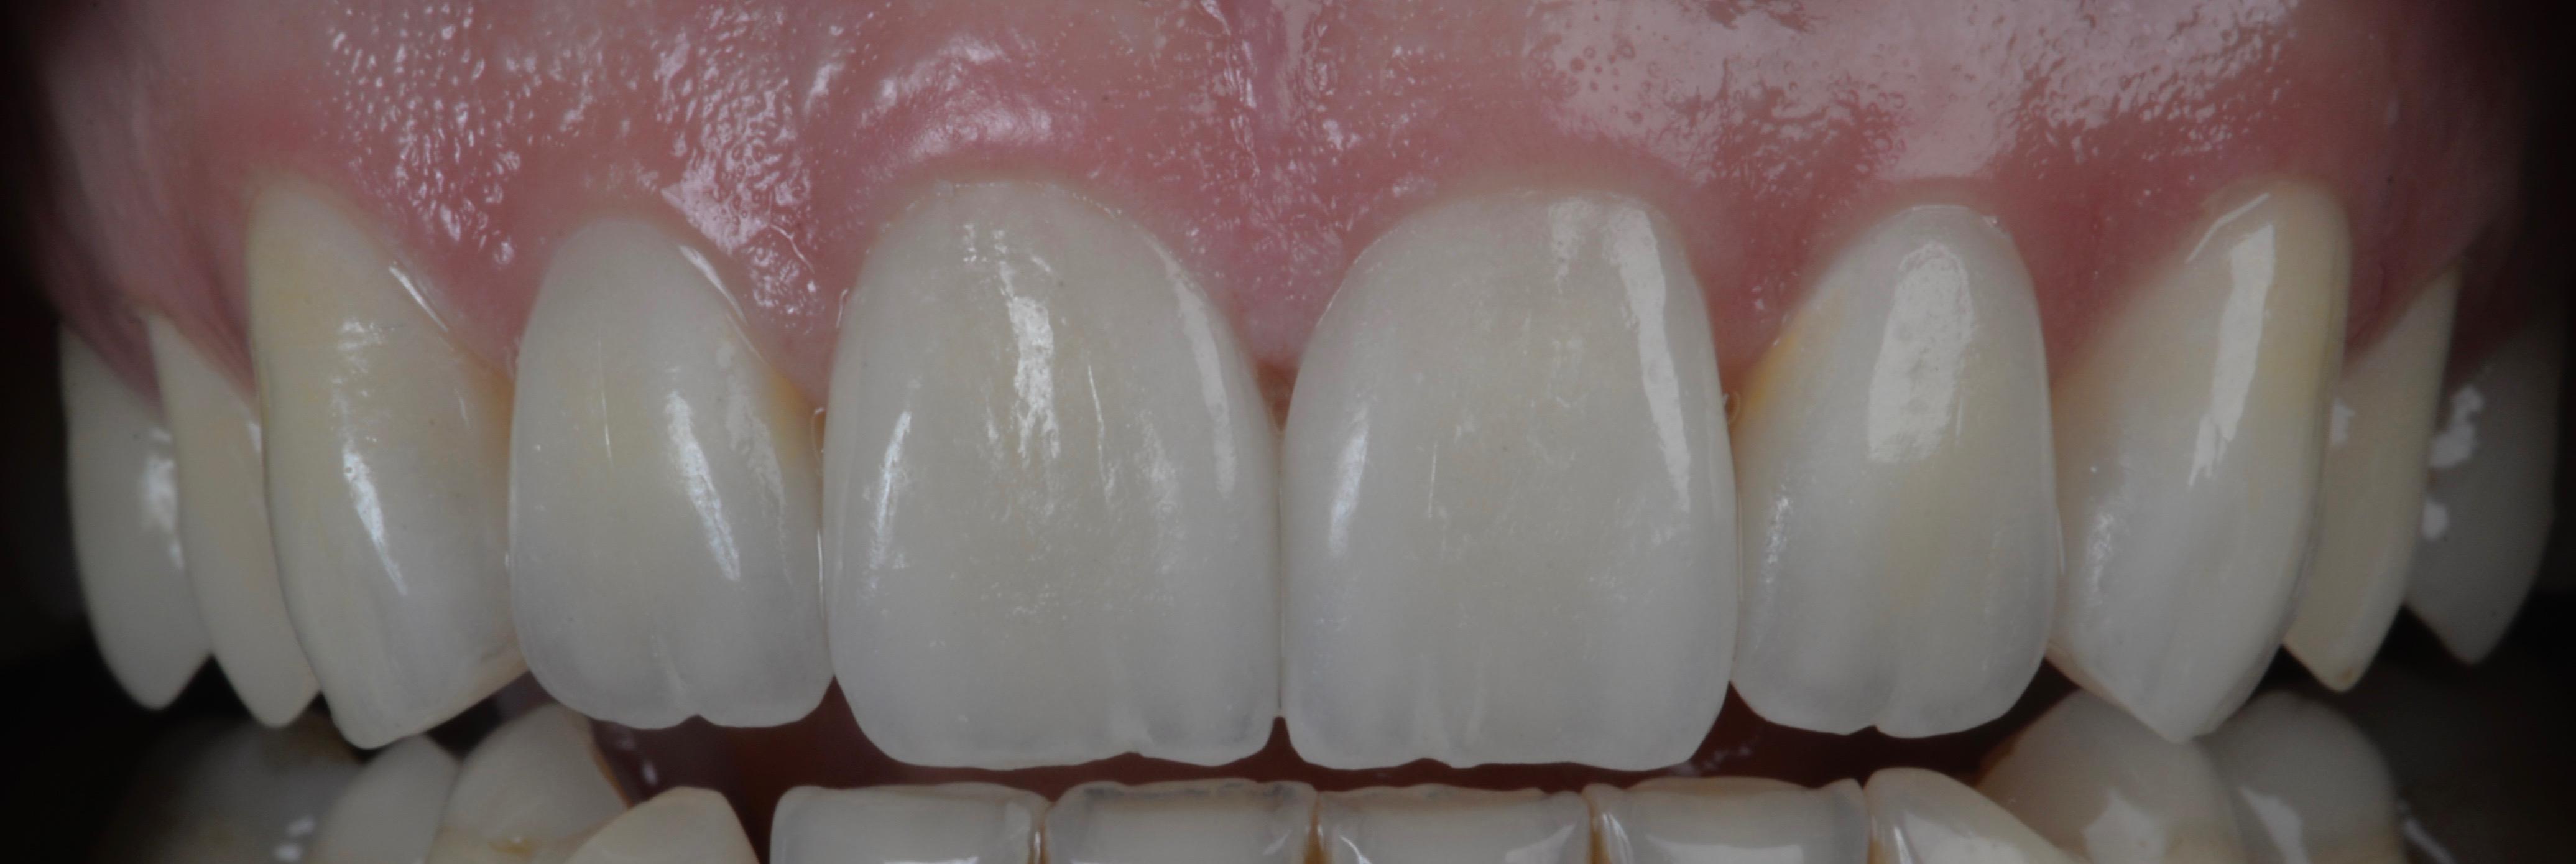 dentiste facettes ceramiques geneve